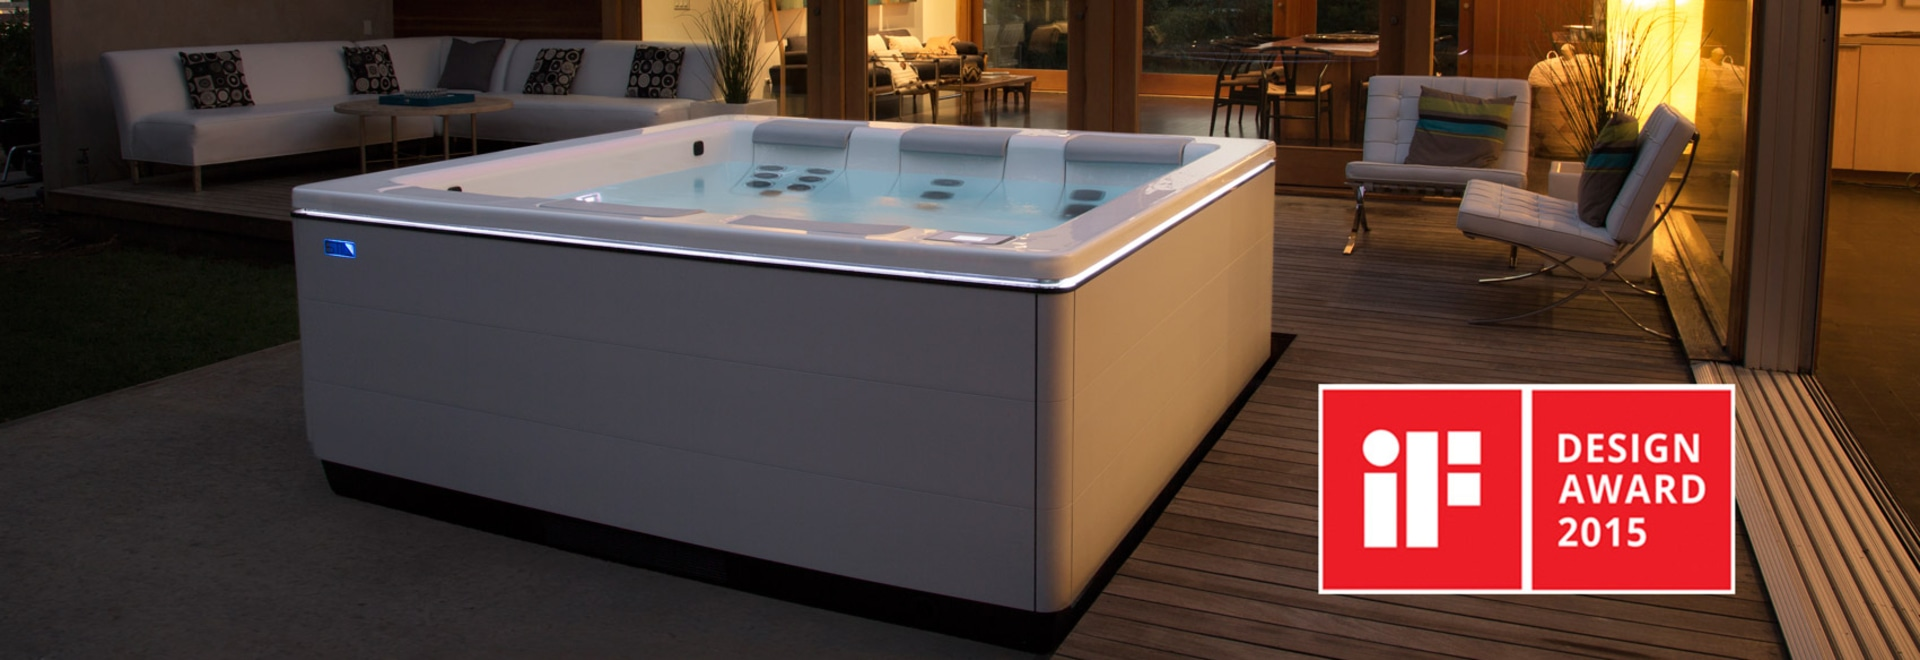 Stil A Modern Portable Hot Tub By Bullfrog Spas Wins If Design